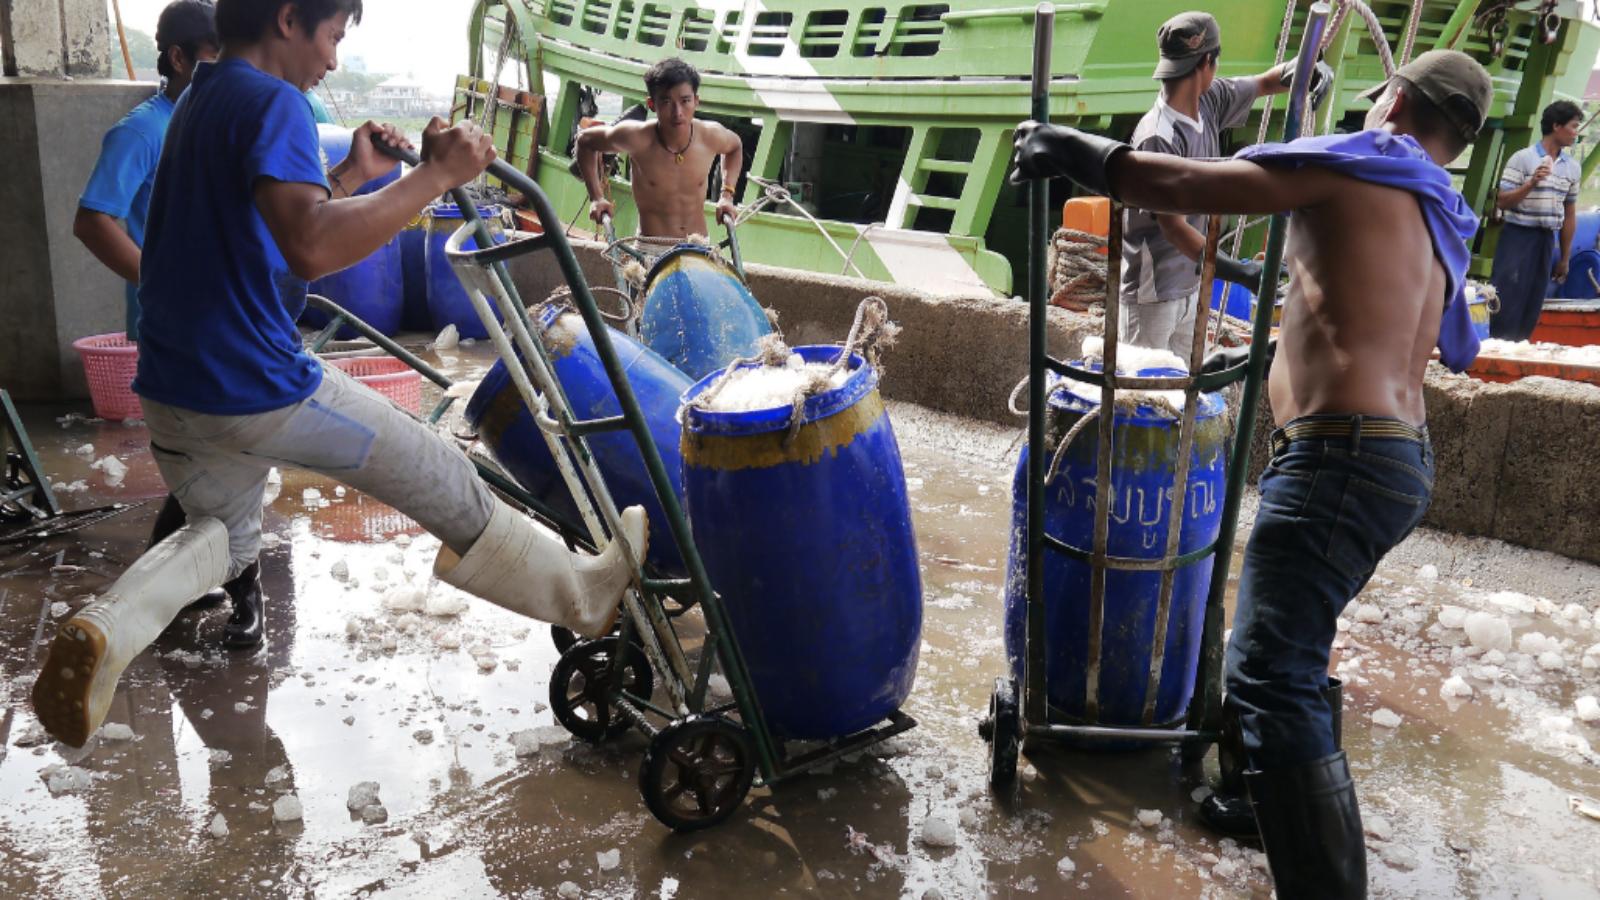 Dockworkers in Thailand load barrels onto a ship.